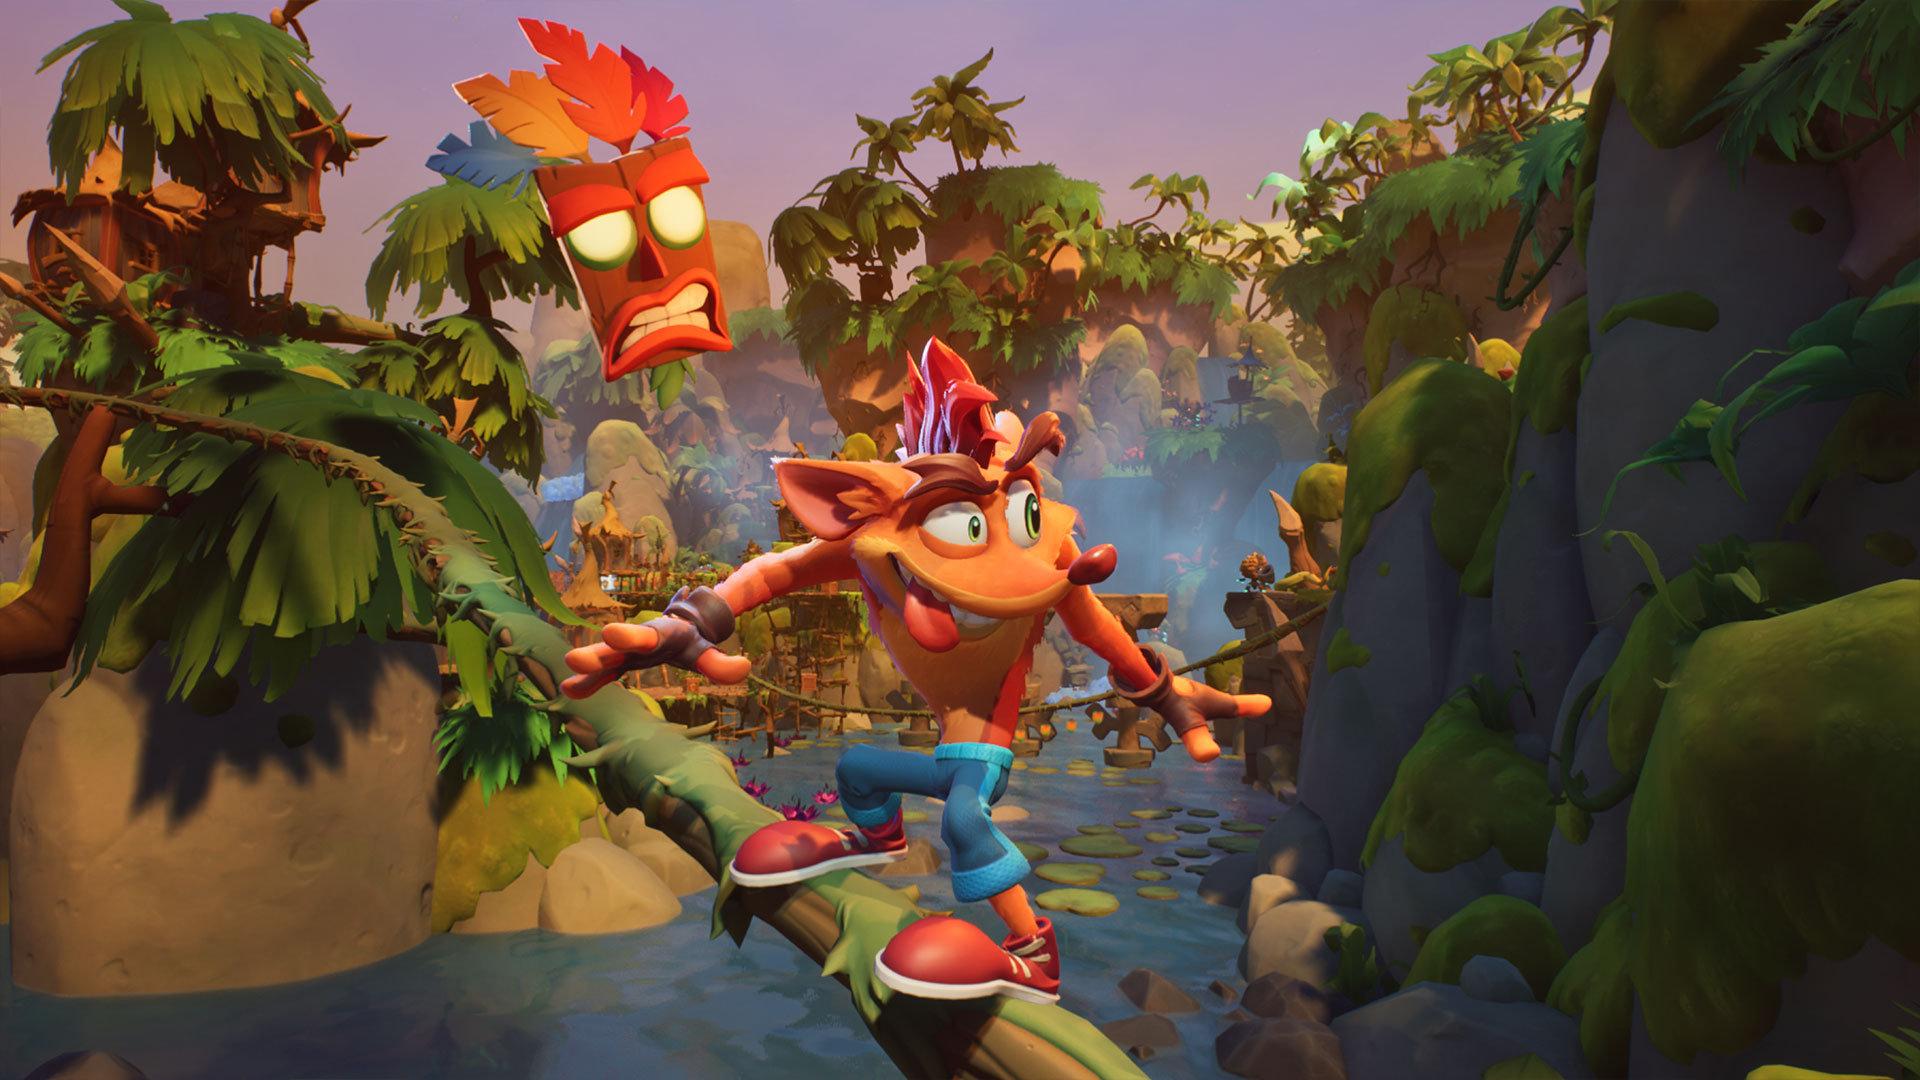 Crash Bandicoot 4: It's About Time dostal launch trailer